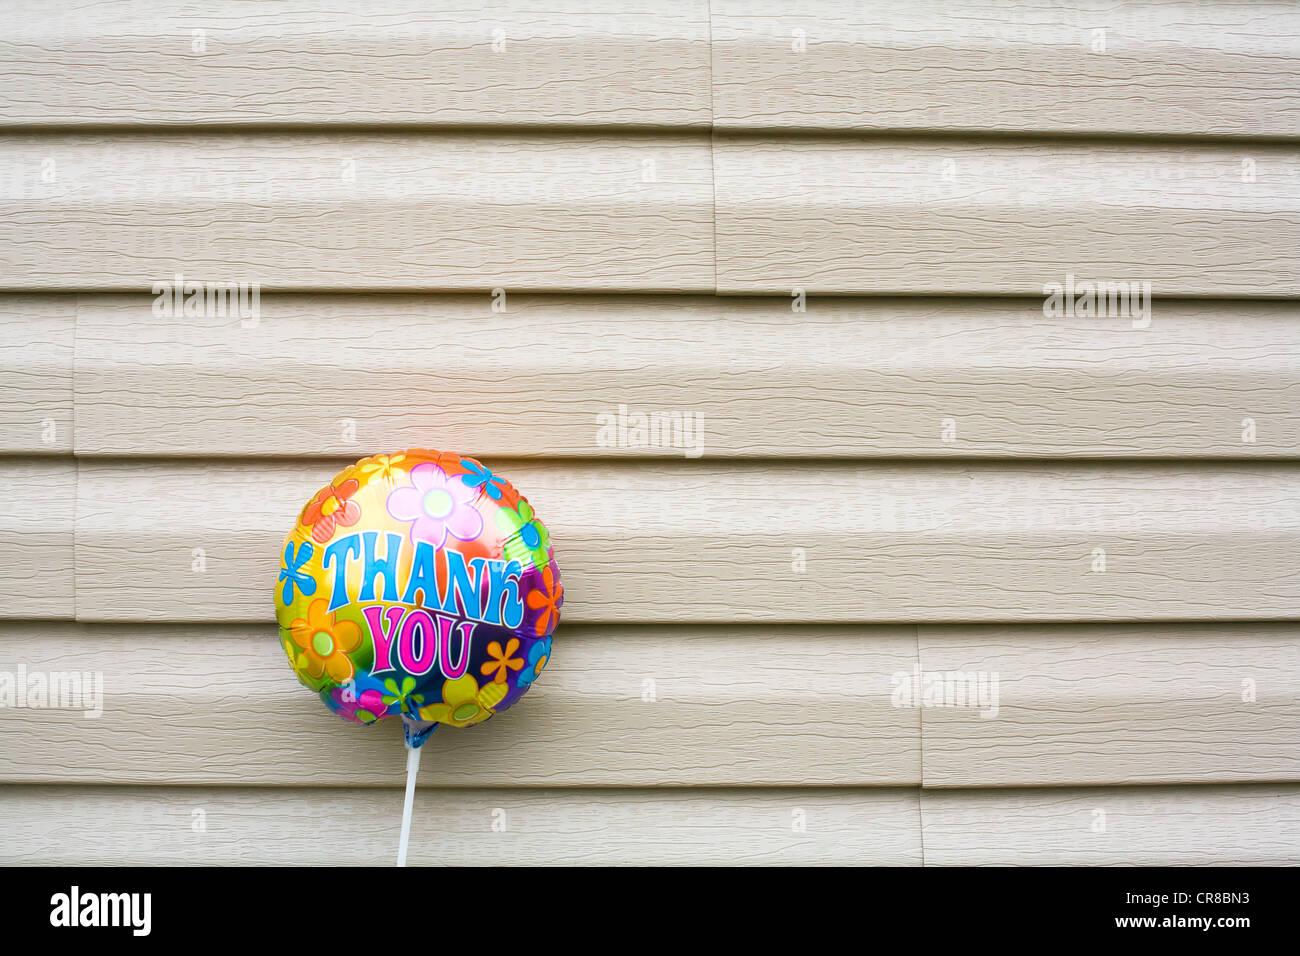 Thank you balloon - Stock Image